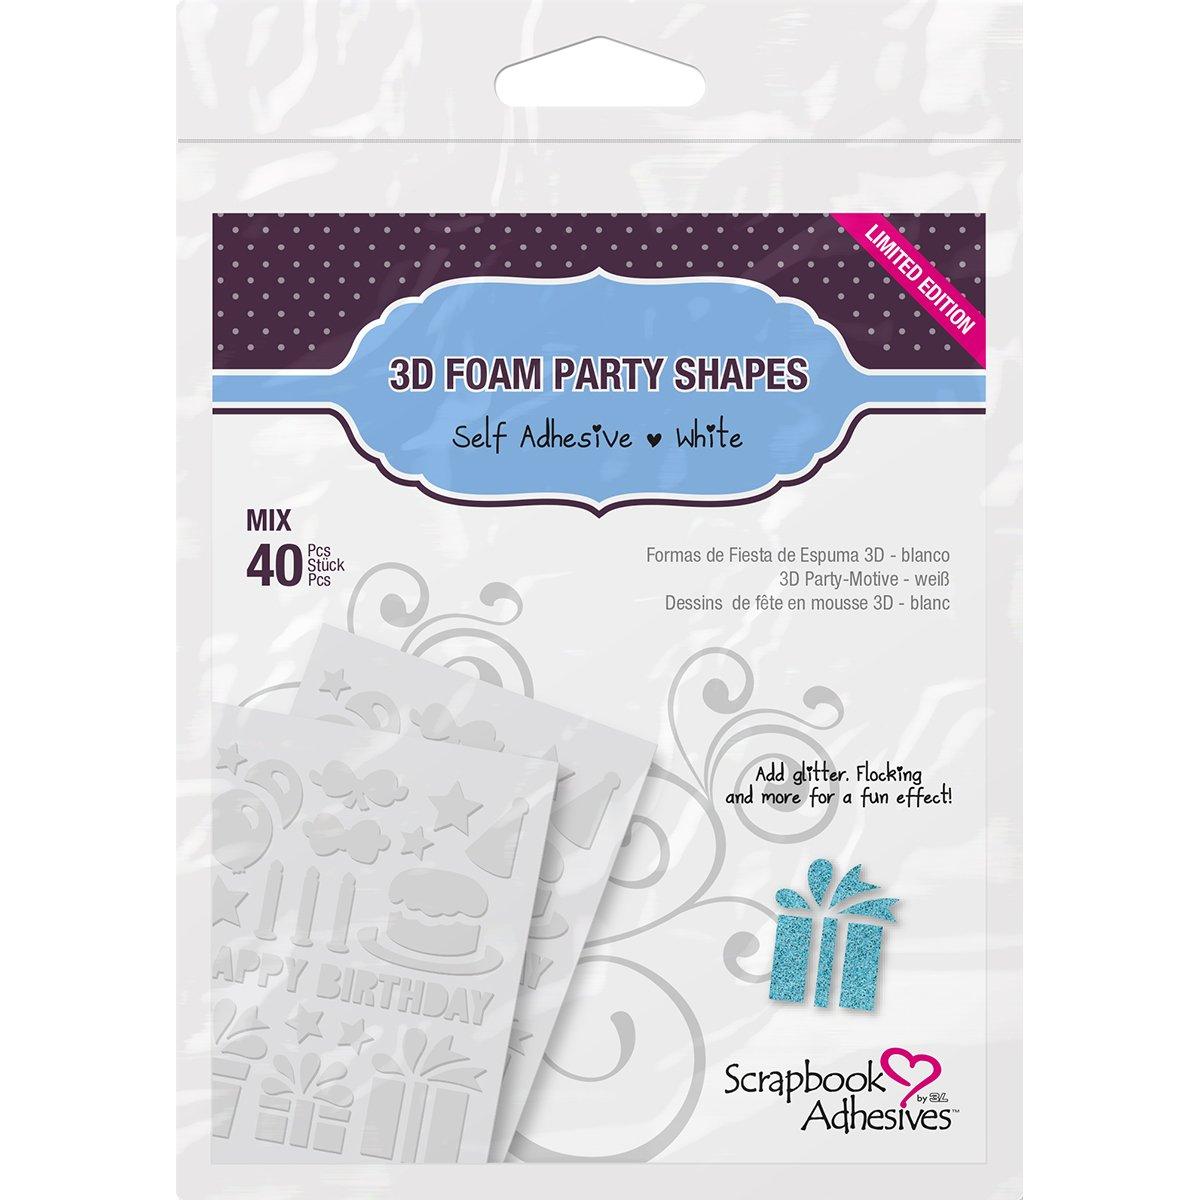 Party shape foam shapes